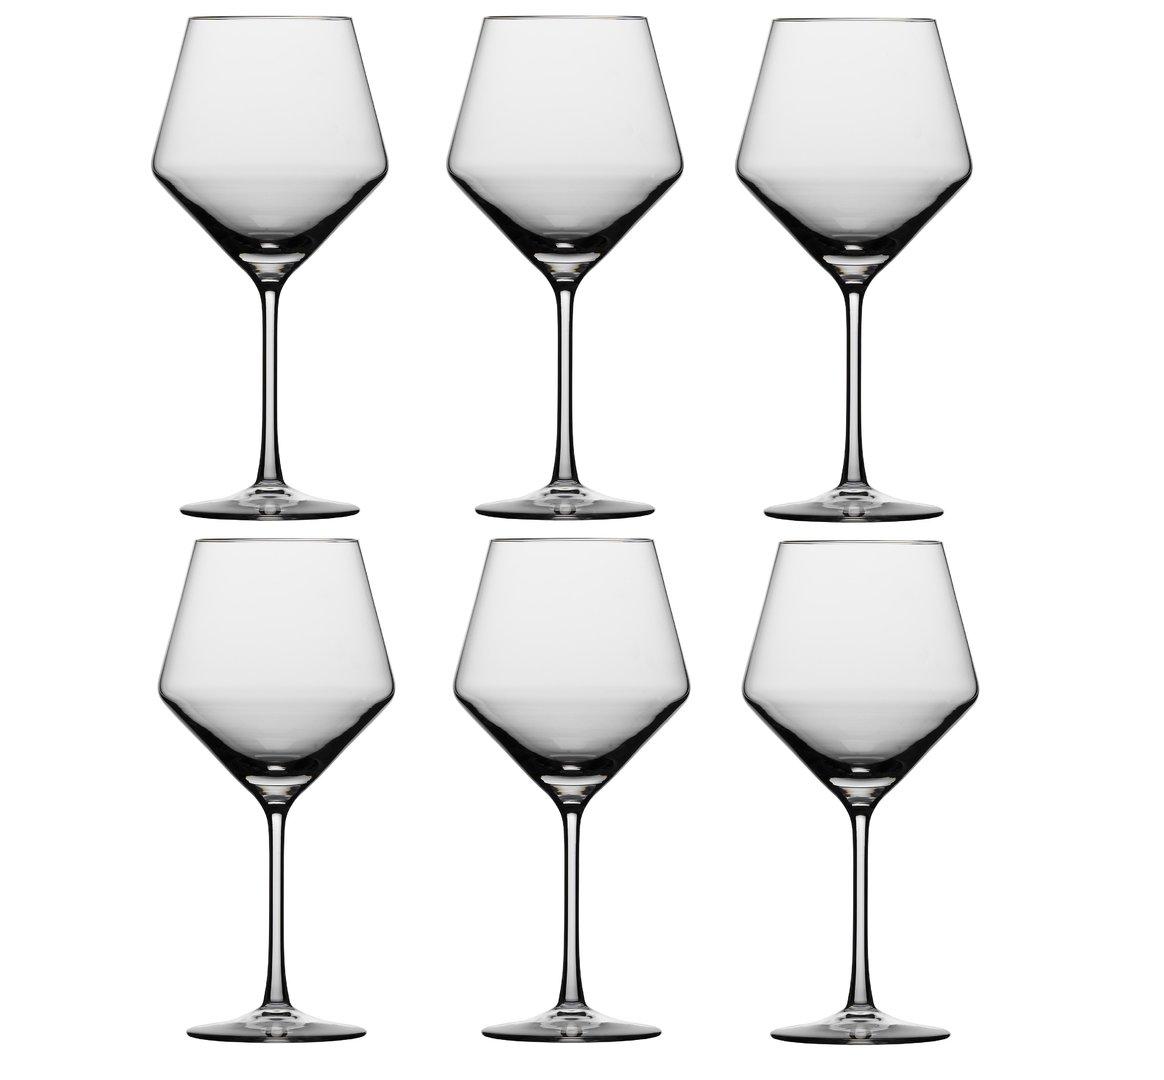 Набор бокал для красного вина Schott Zwiesel PURE, объем 0,692 л, прозрачный, 6 штук Schott Zwiesel 112421_6шт фото 2